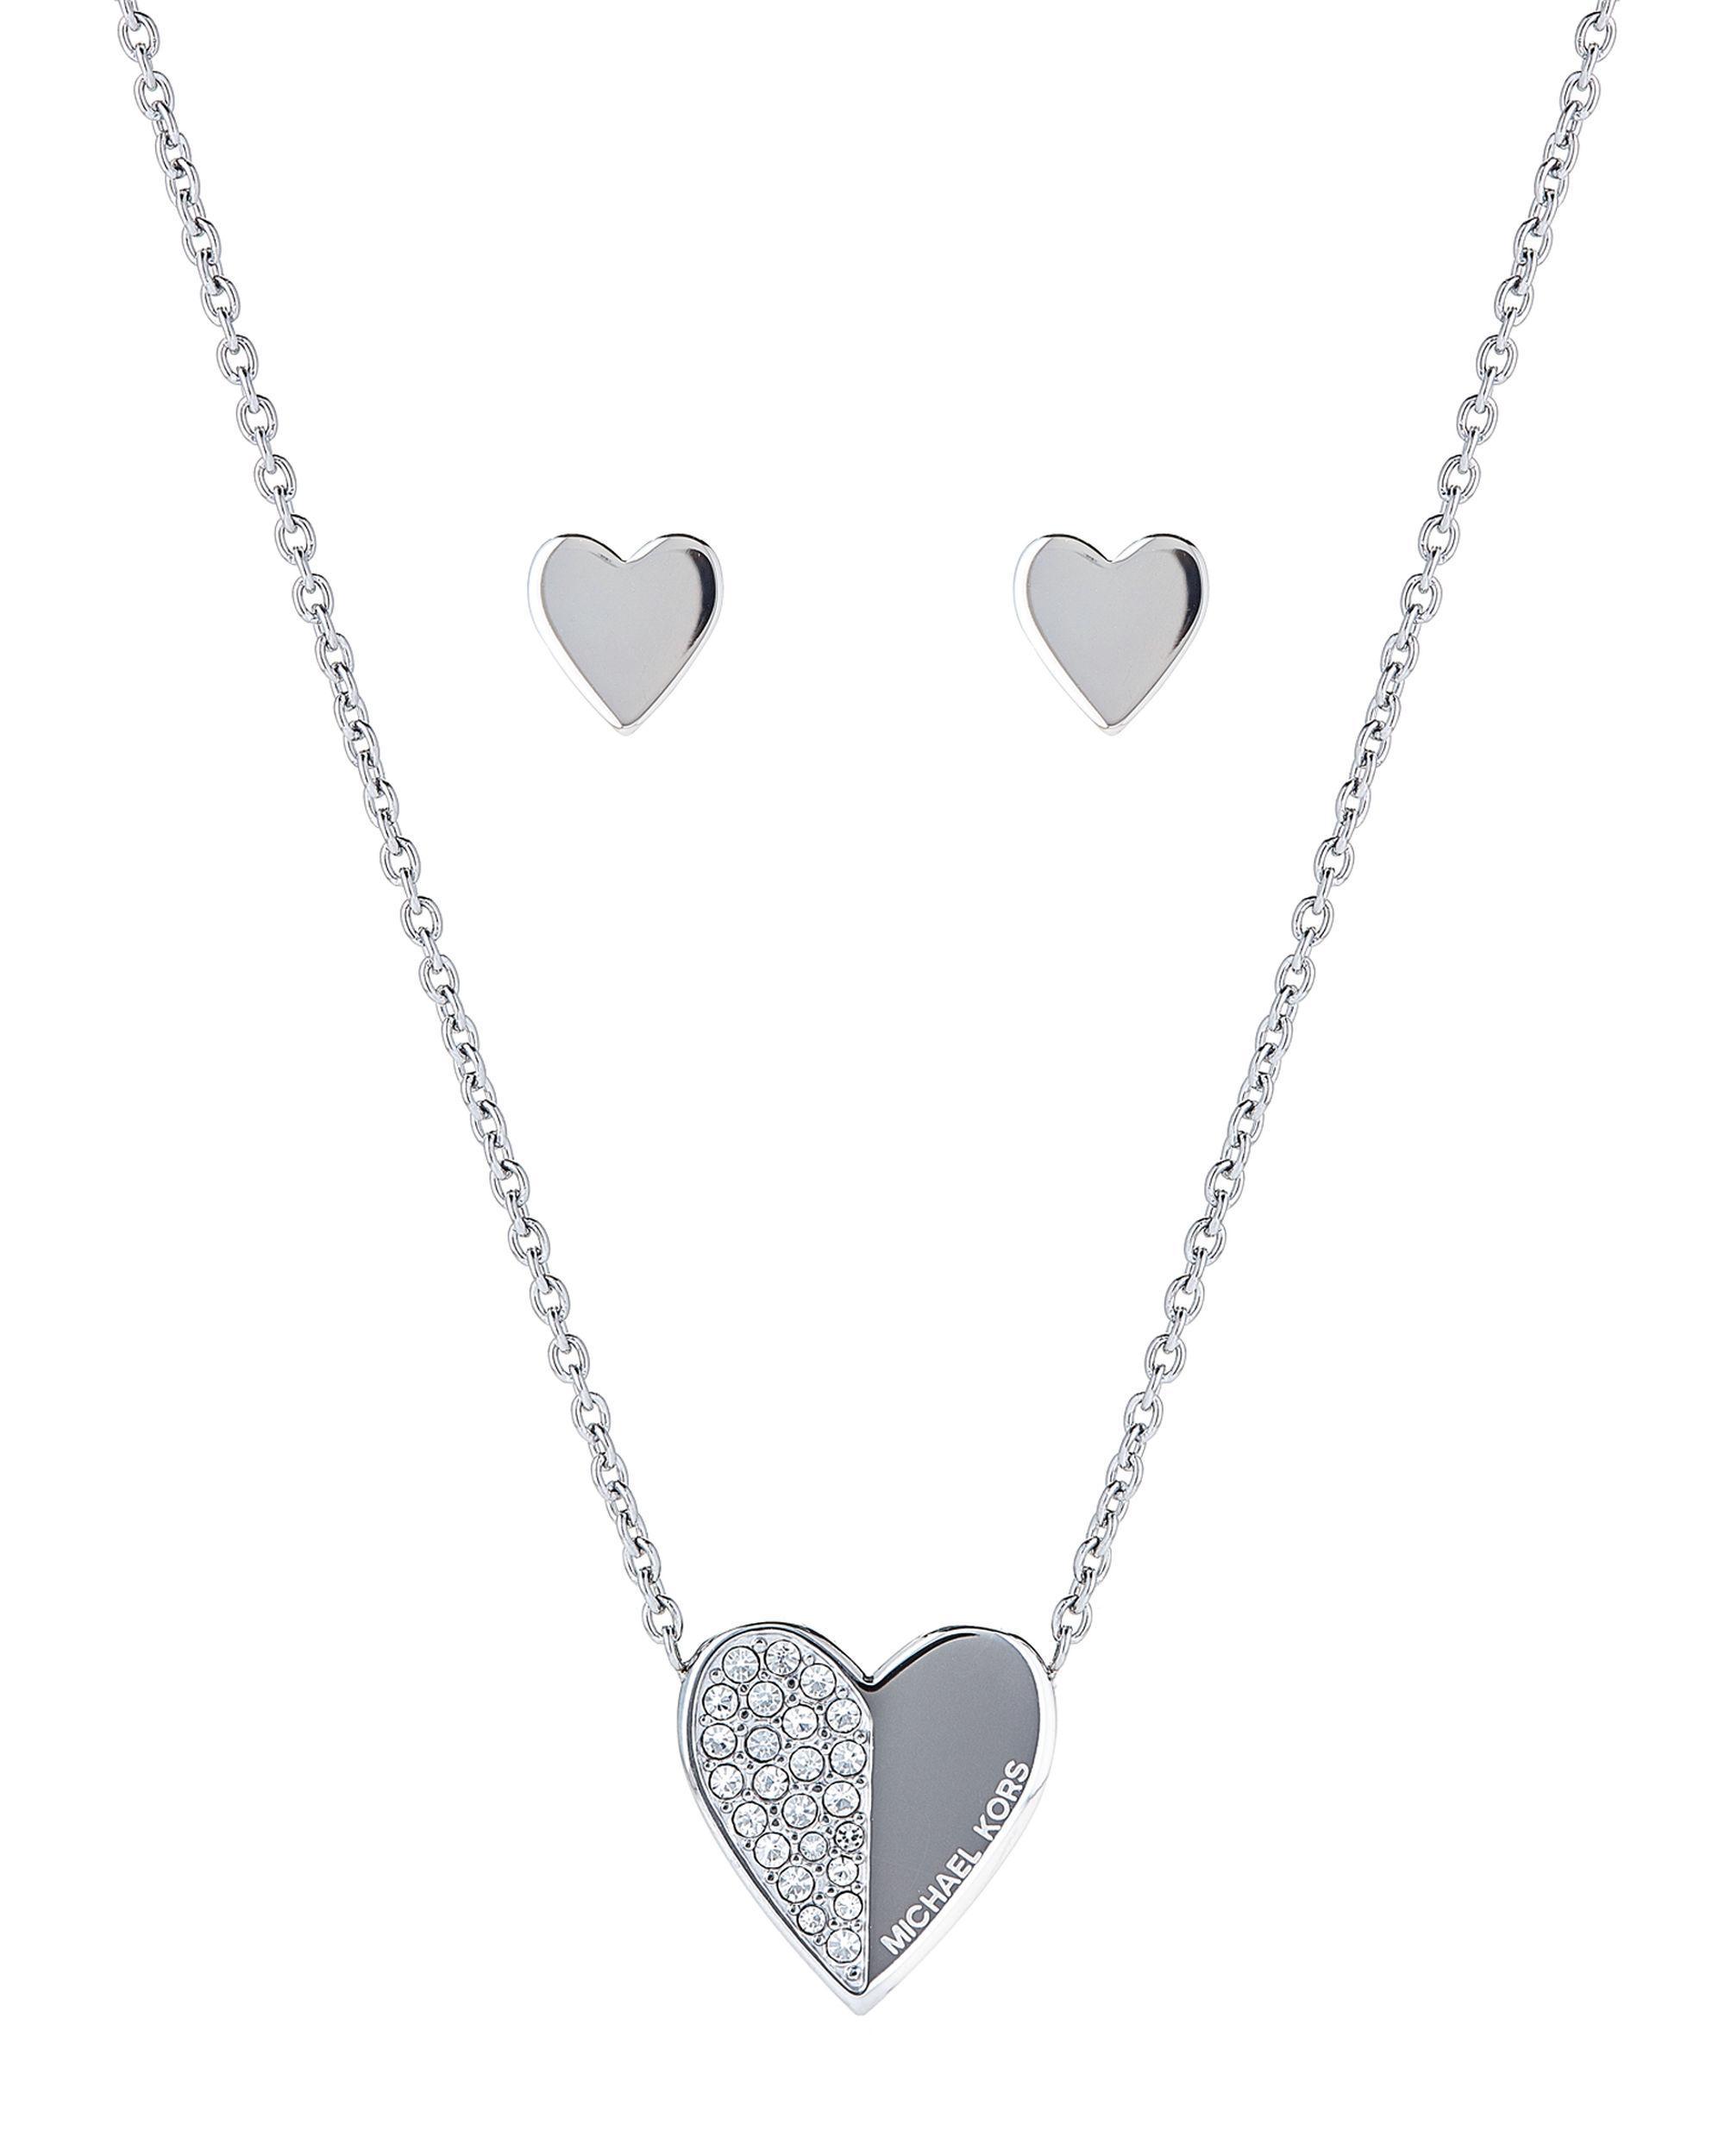 752fbcc9b Michael Kors - Metallic Silver-tone Heart Pendant Necklace & Stud Earrings  Set - Lyst. View fullscreen